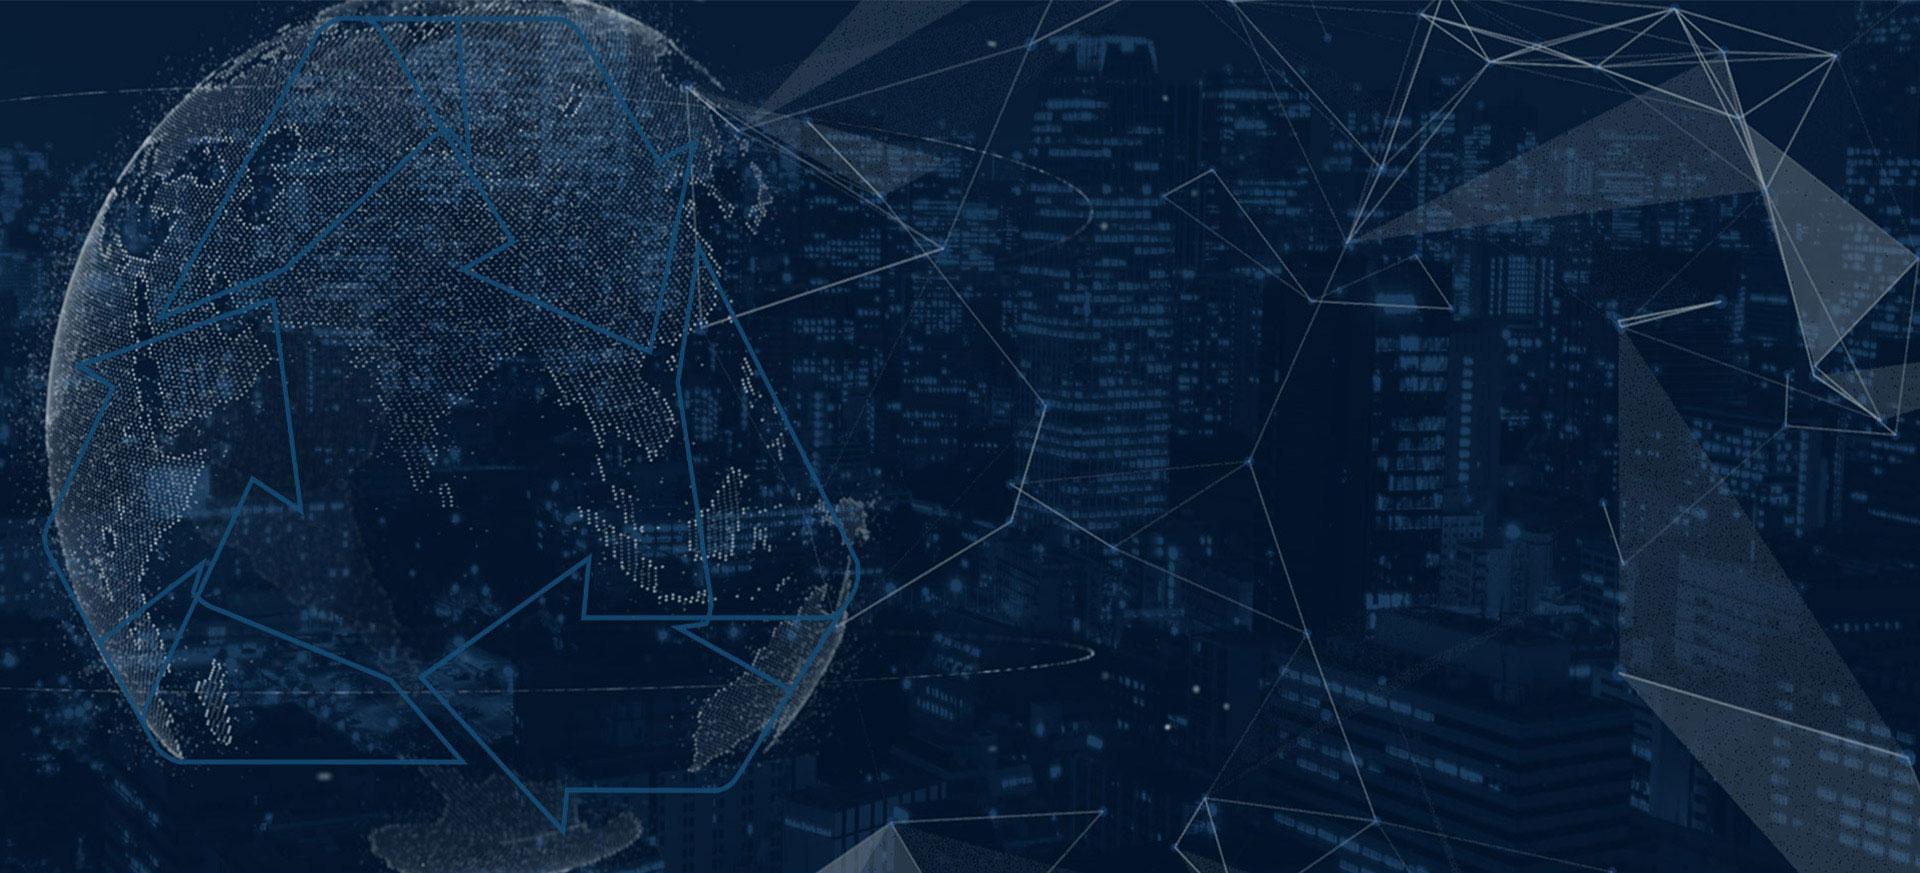 ESG: Environmental, social and corporate governance